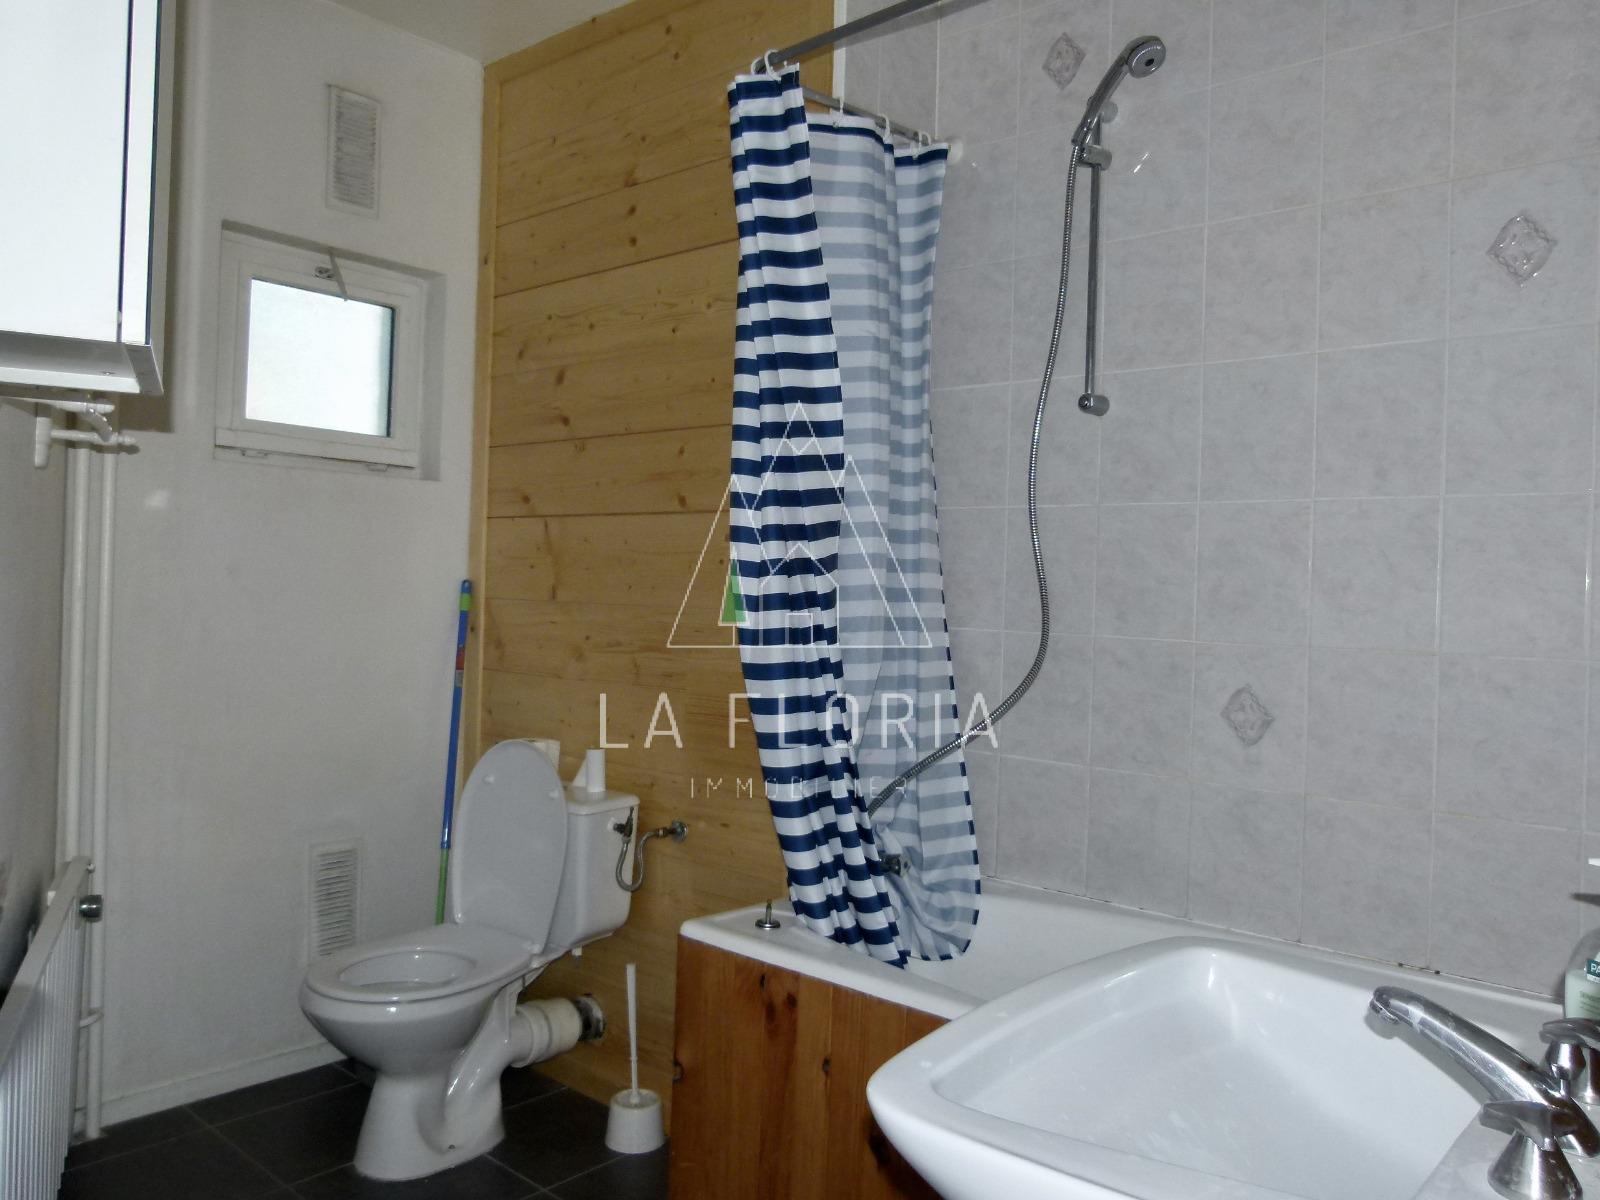 1 BEDROOM 35 M2 APARTMENT CENTRAL CHAMONIX